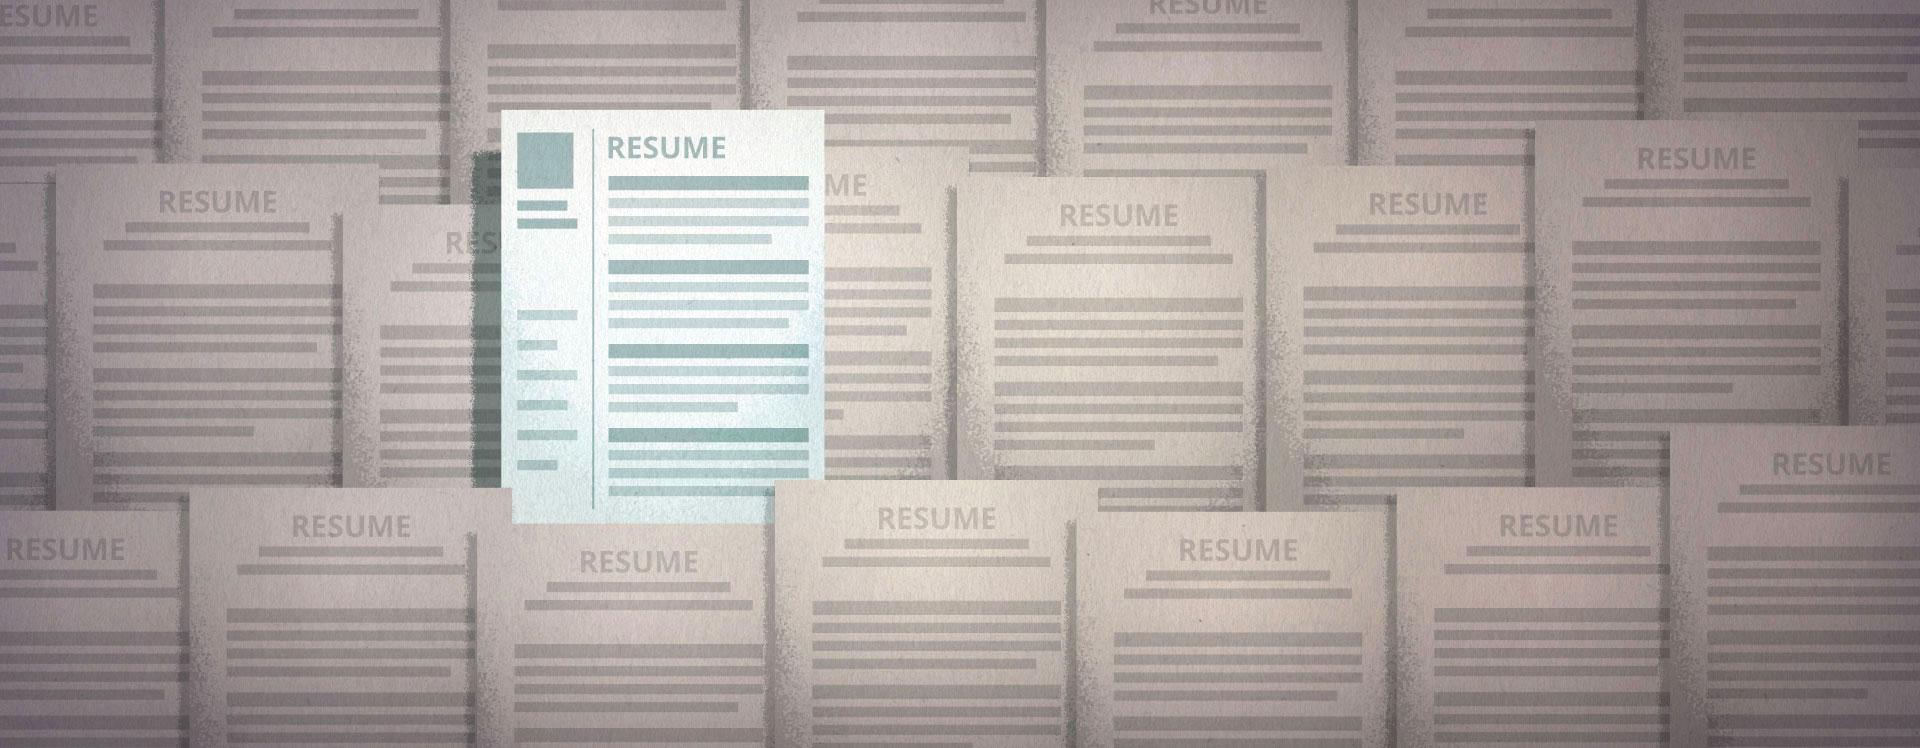 health information resume